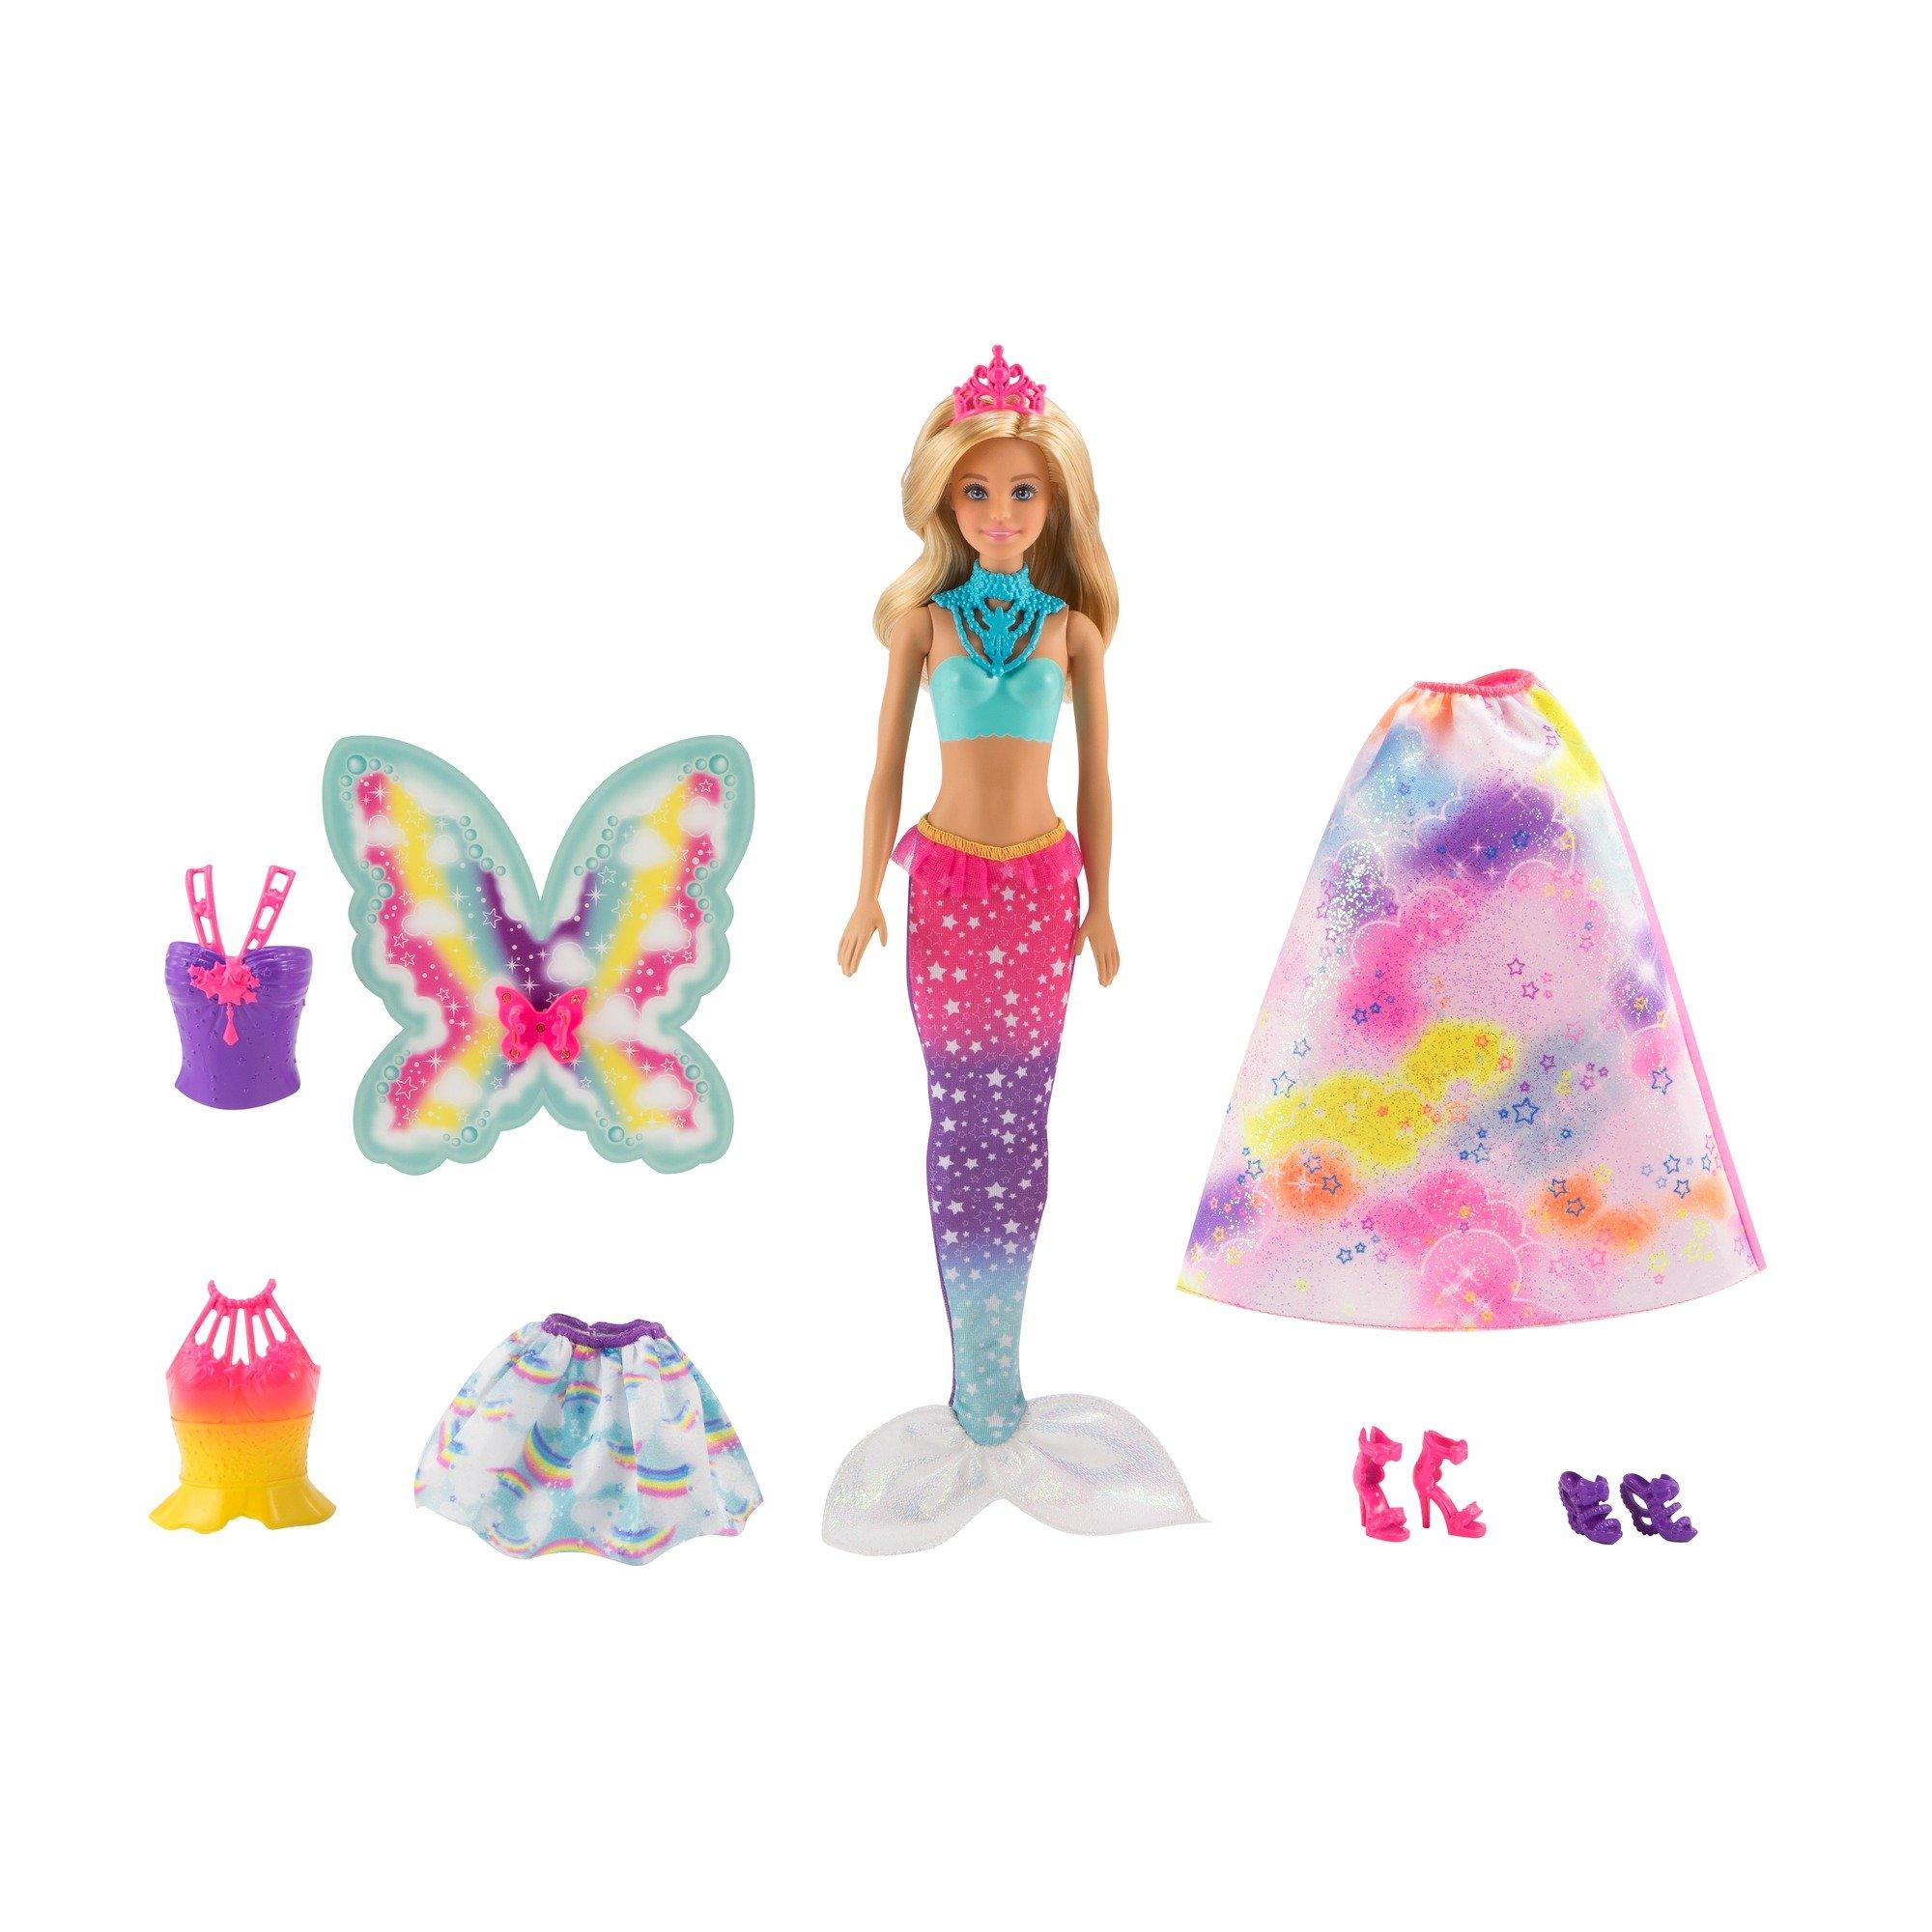 Barbie Dreamtopia Rainbow Cove Fairytale Dress Up Set, Blonde